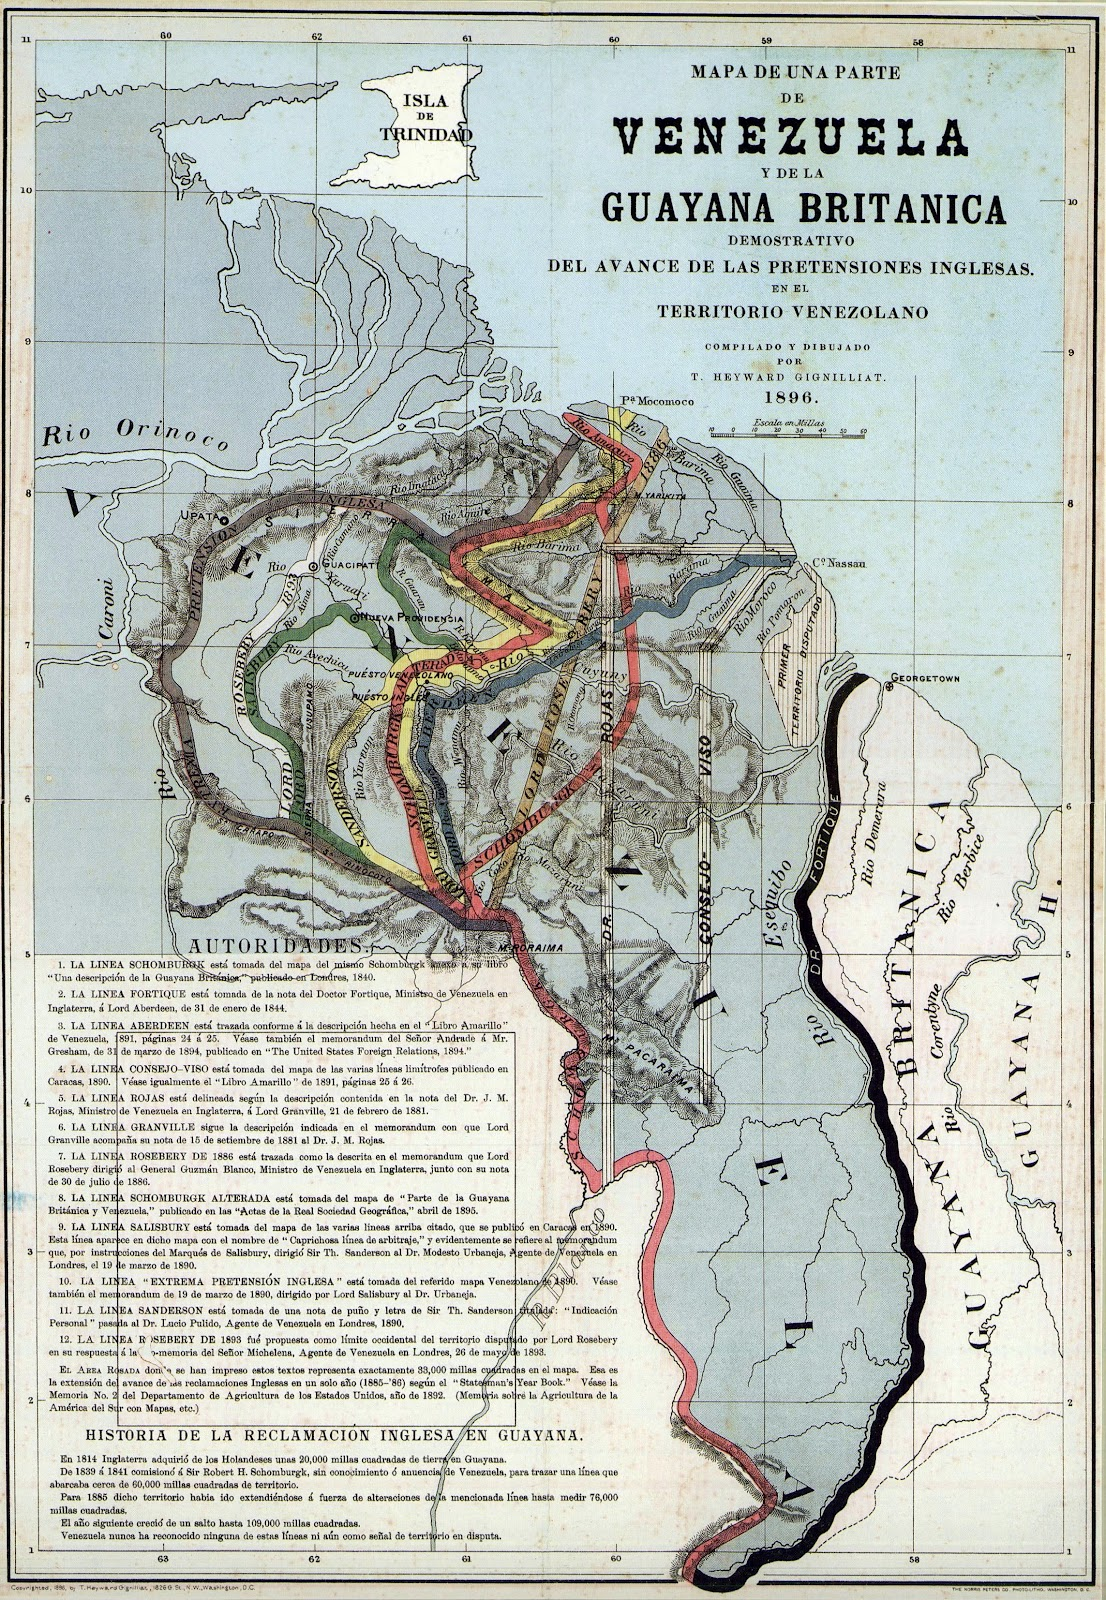 Historia de guyana wikipedia la enciclopedia libre for He firmado acuerdo clausula suelo